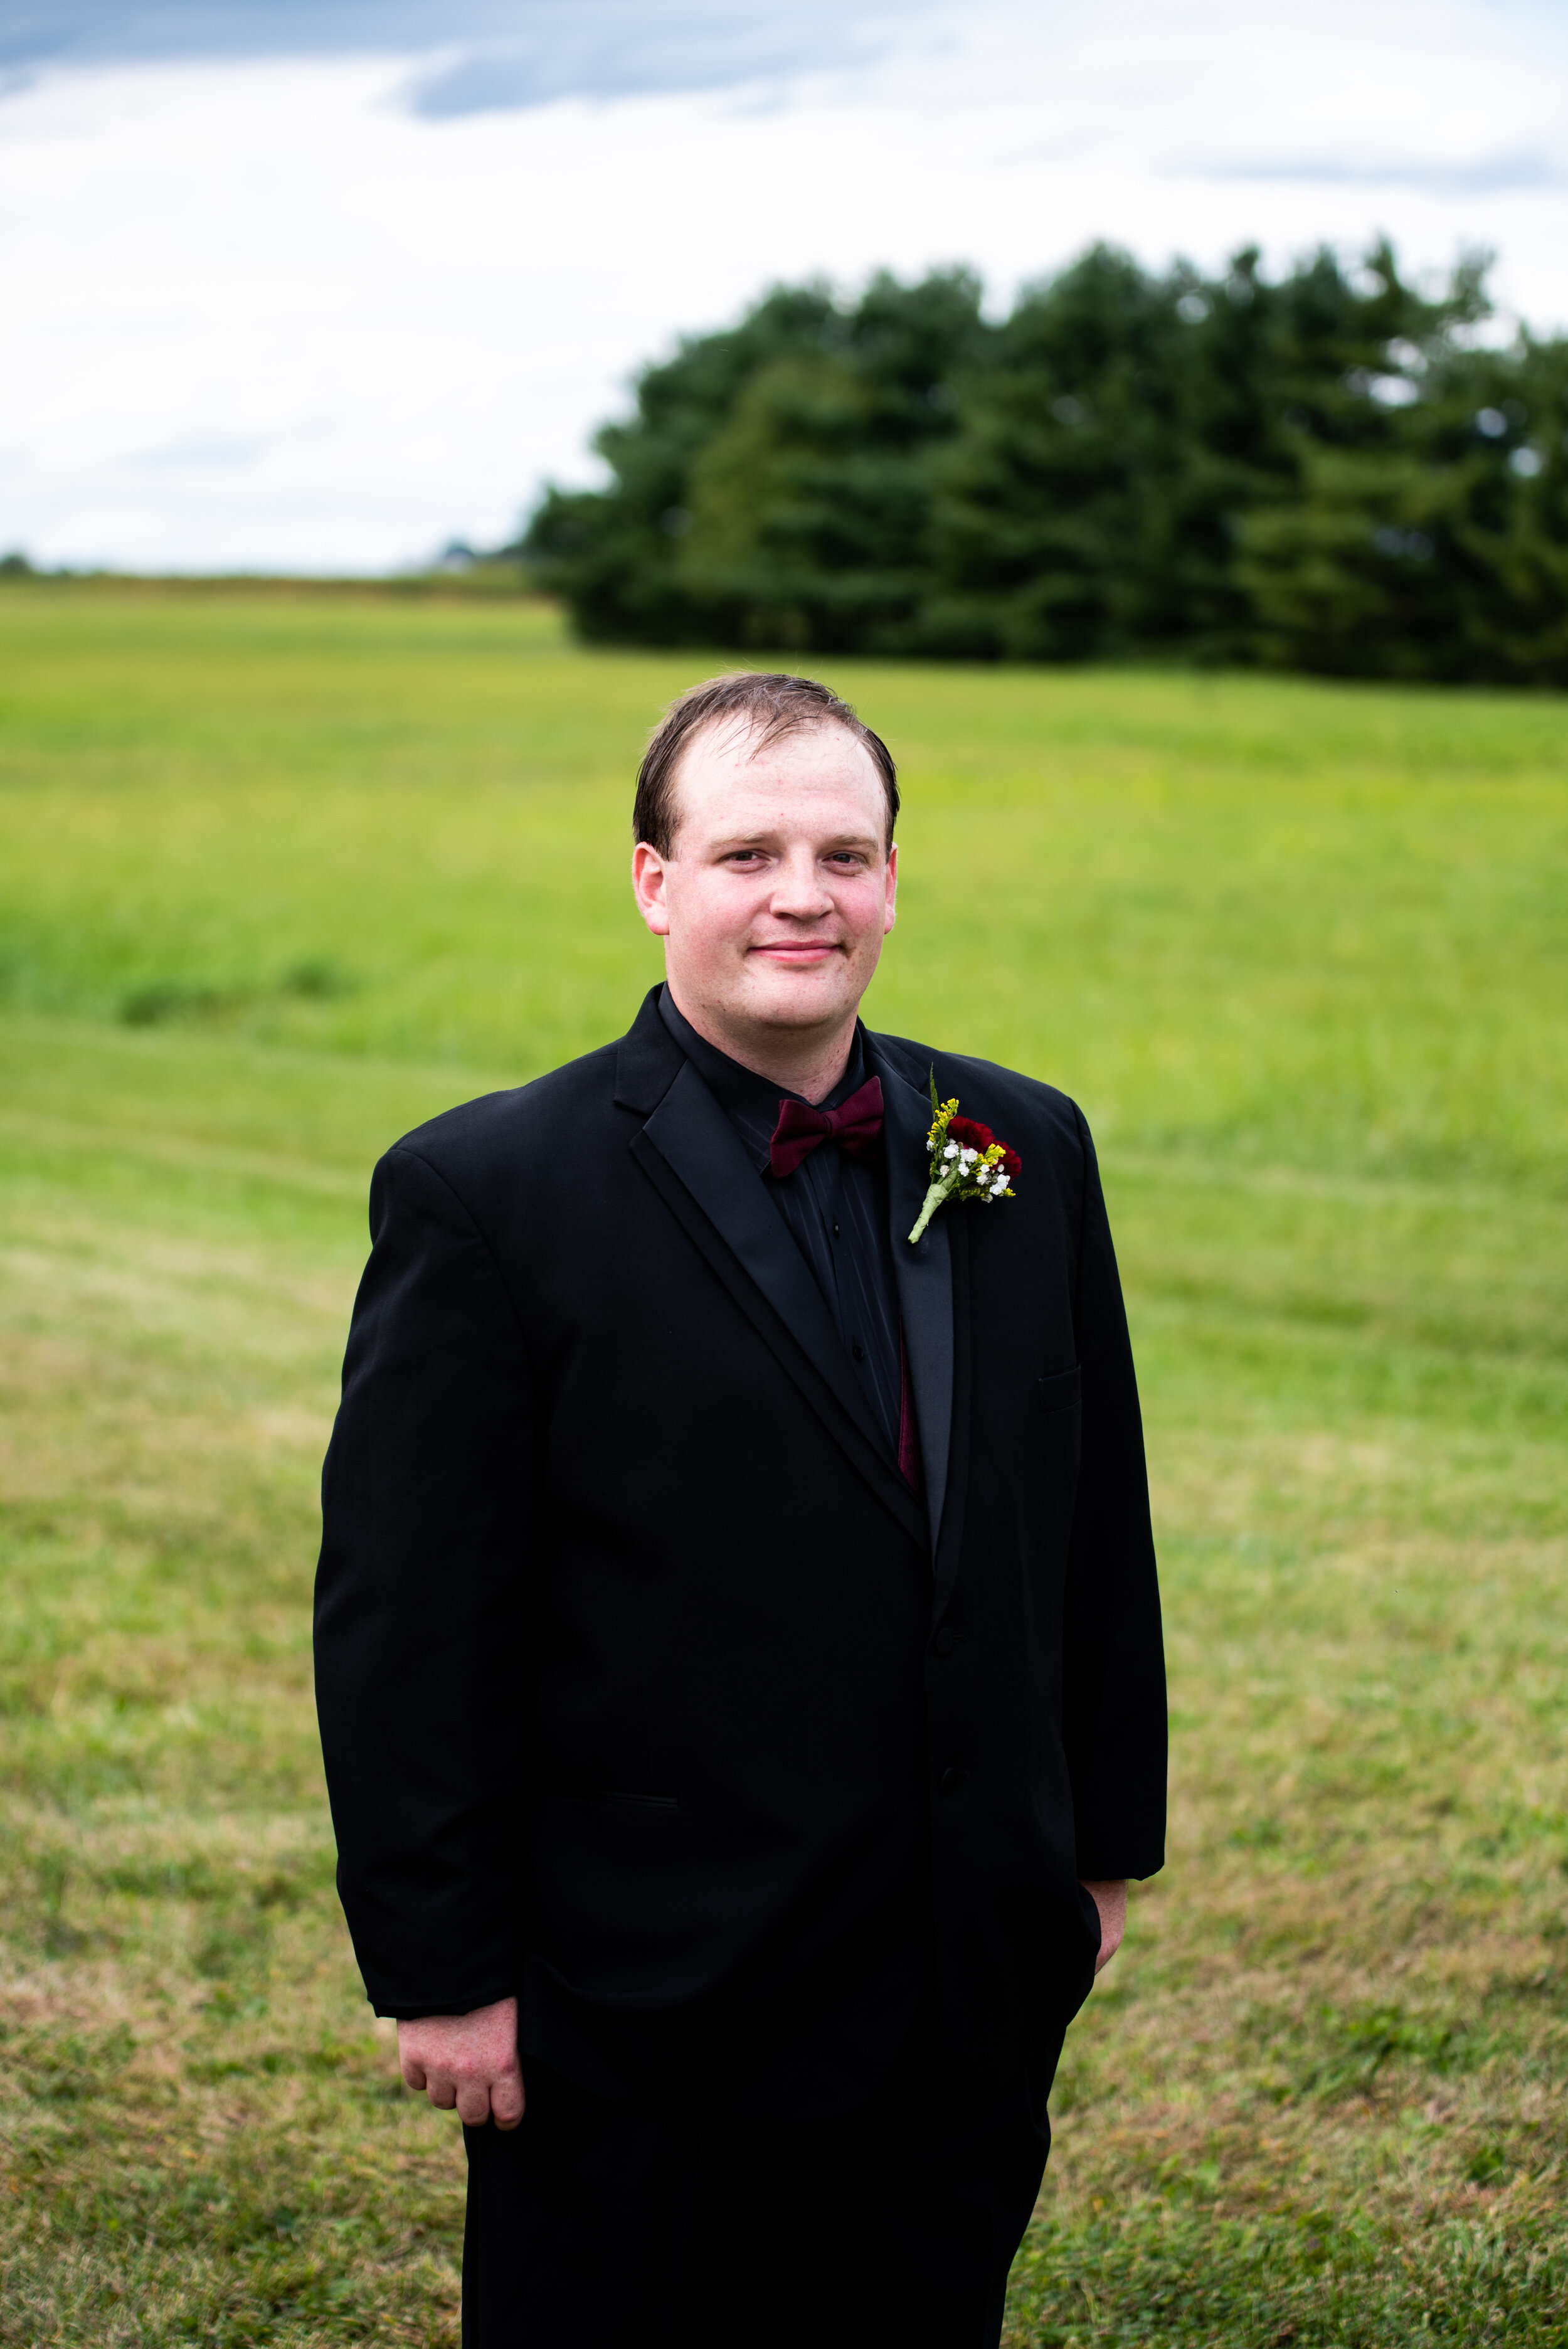 wedding (52 of 205).jpg